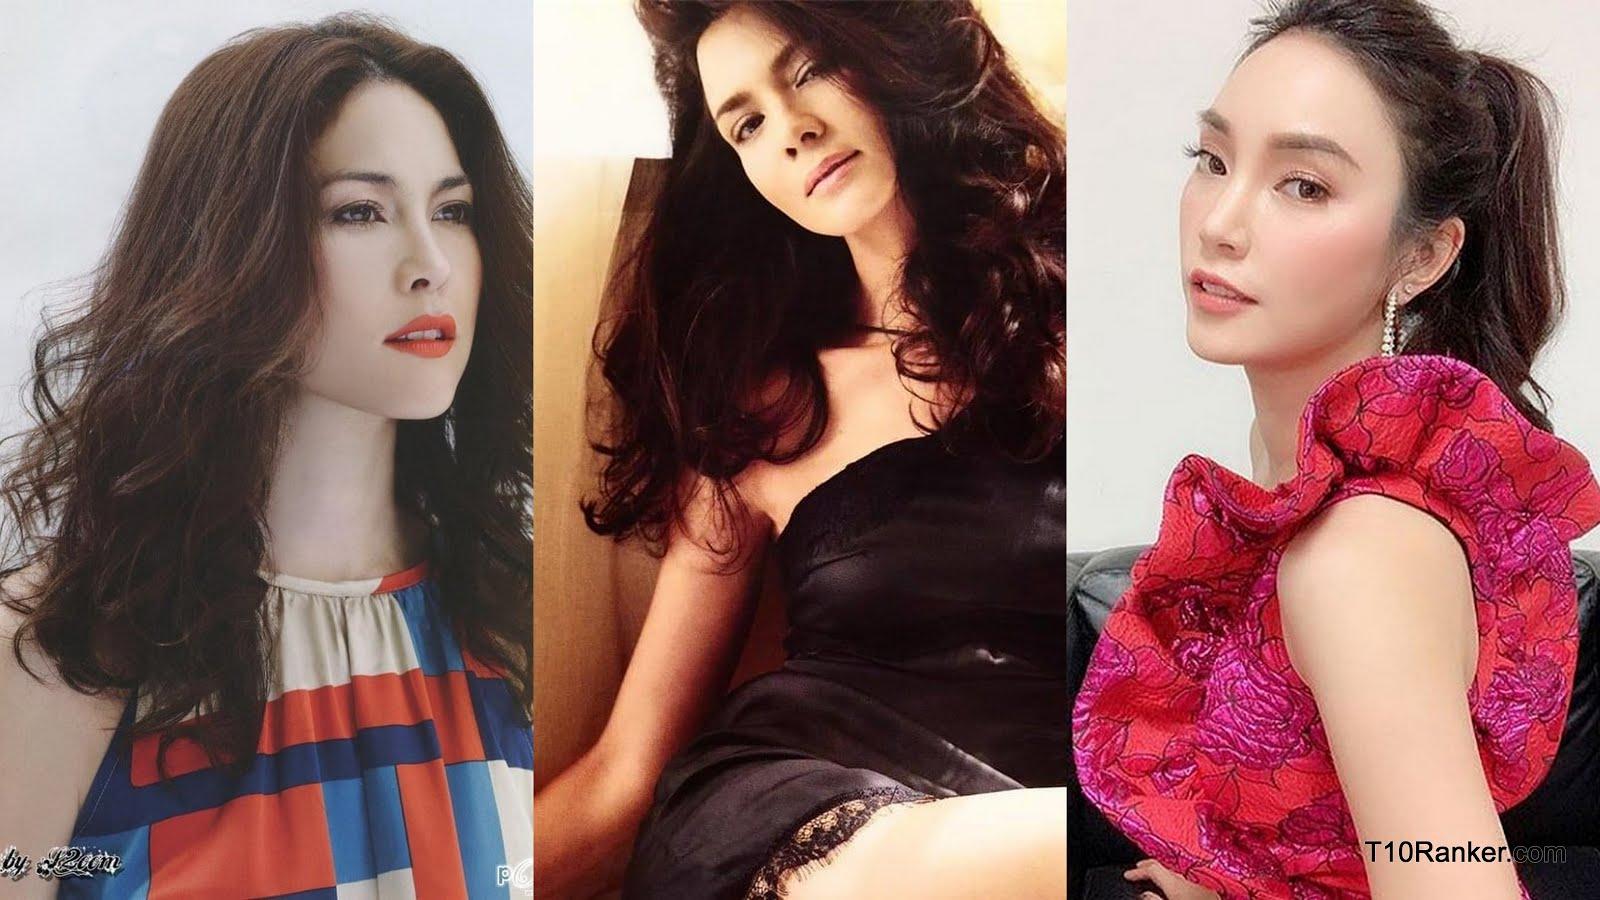 Most beautiful hot women